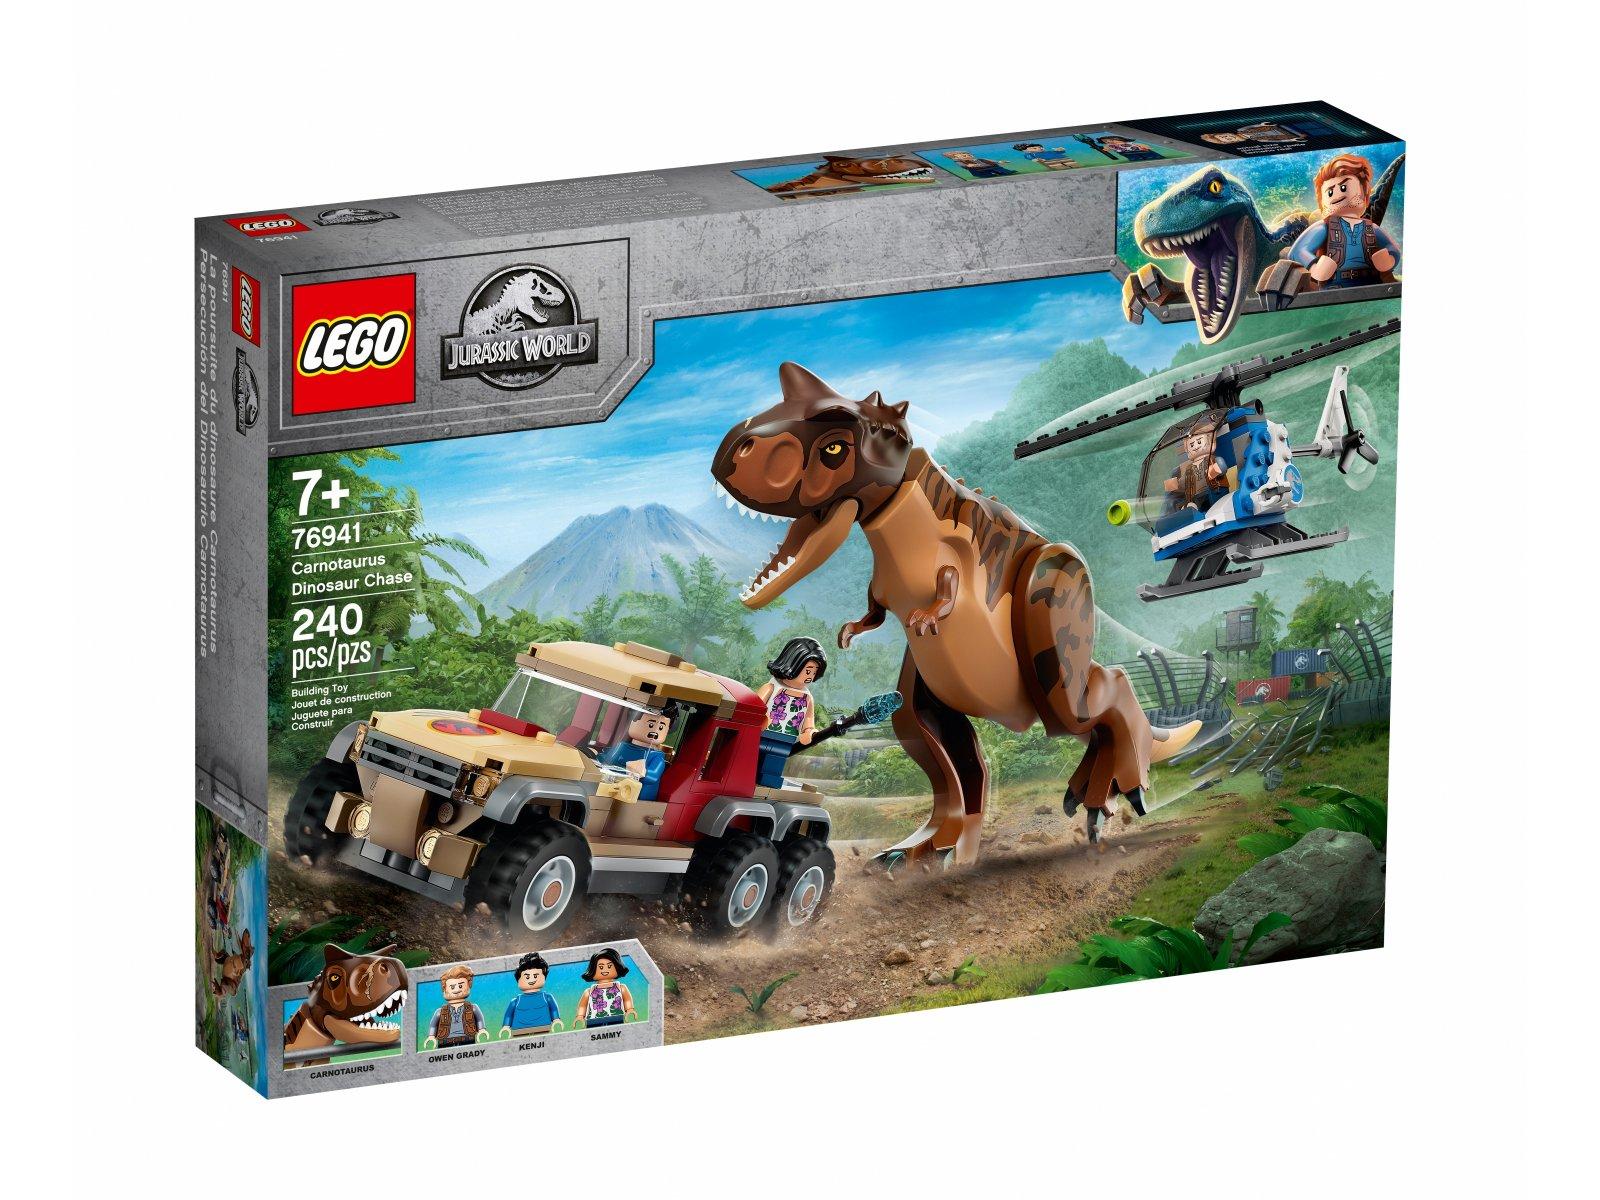 LEGO 76941 Jurassic World Pościg za karnotaurem